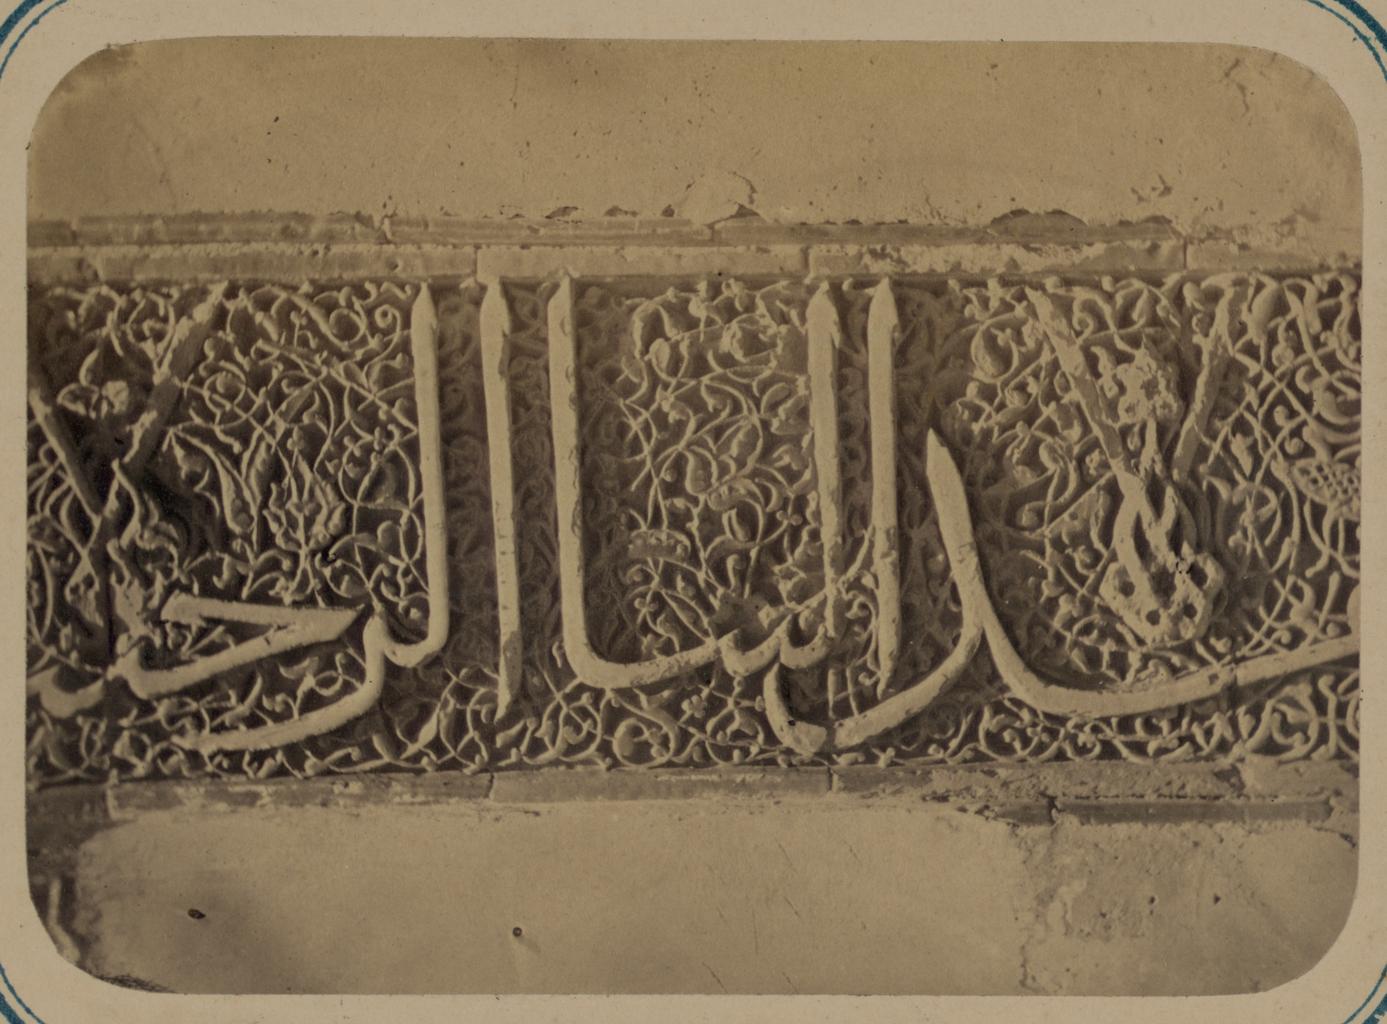 Мавзолей Ша-Арап. Часть надписи на фасаде